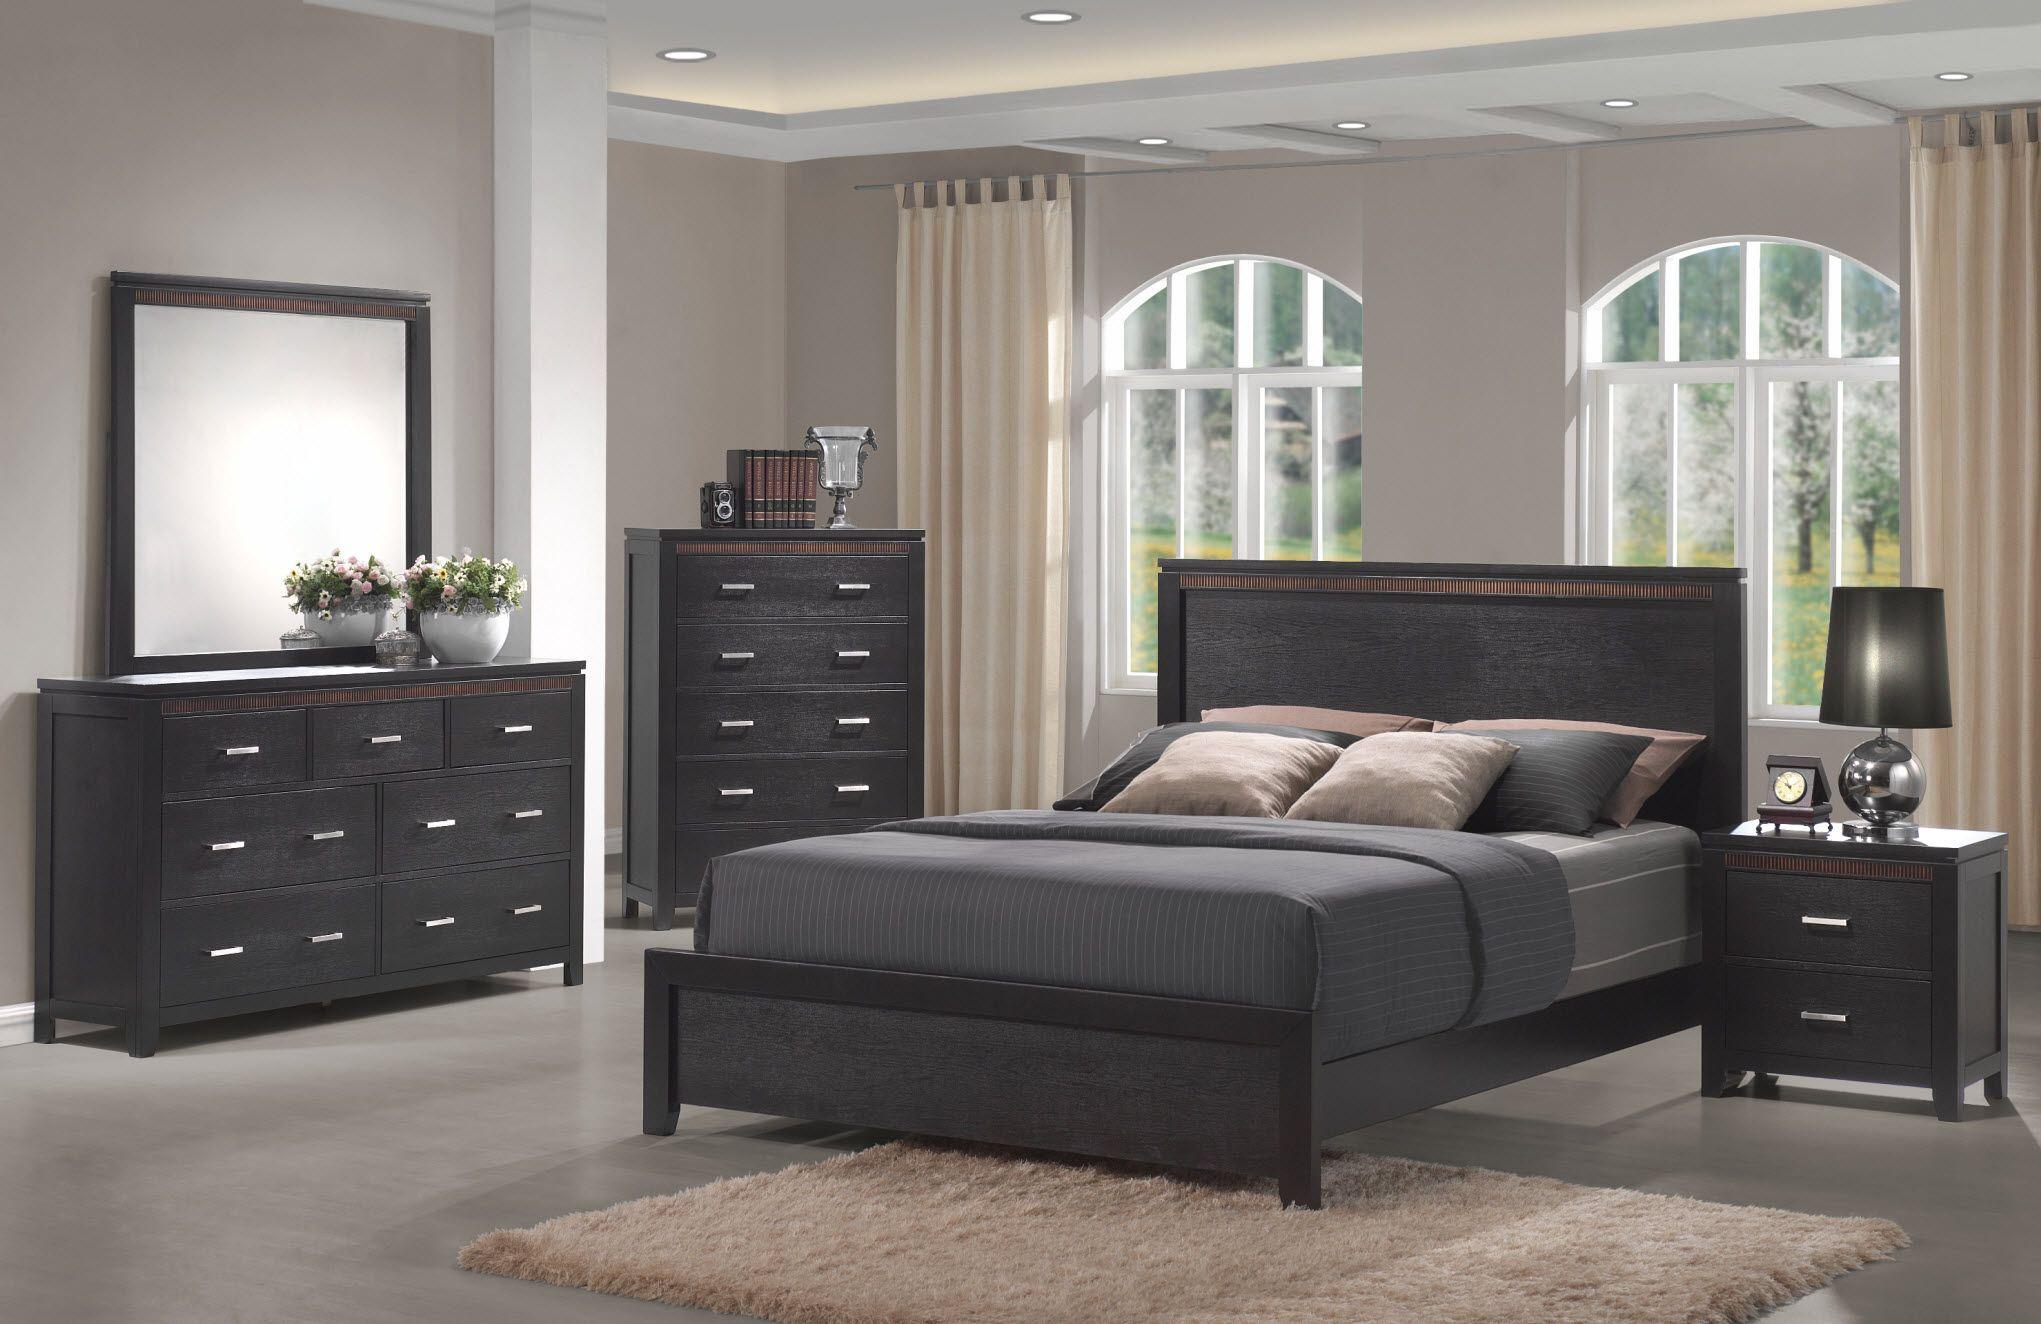 Trendy bed room furniture set design ideas